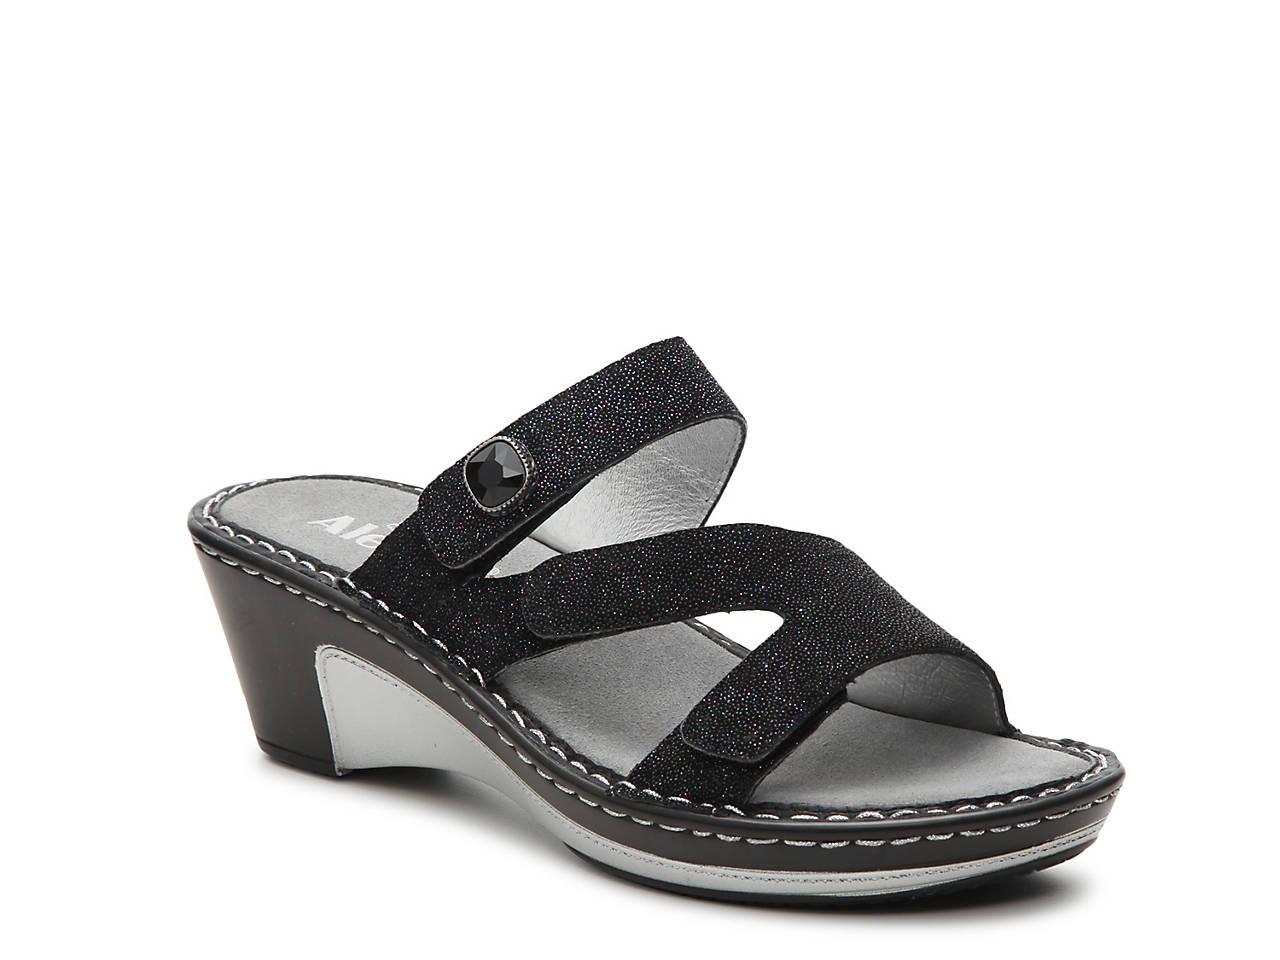 ac6778ffee8 Alegria Loti Wedge Sandal Women s Shoes